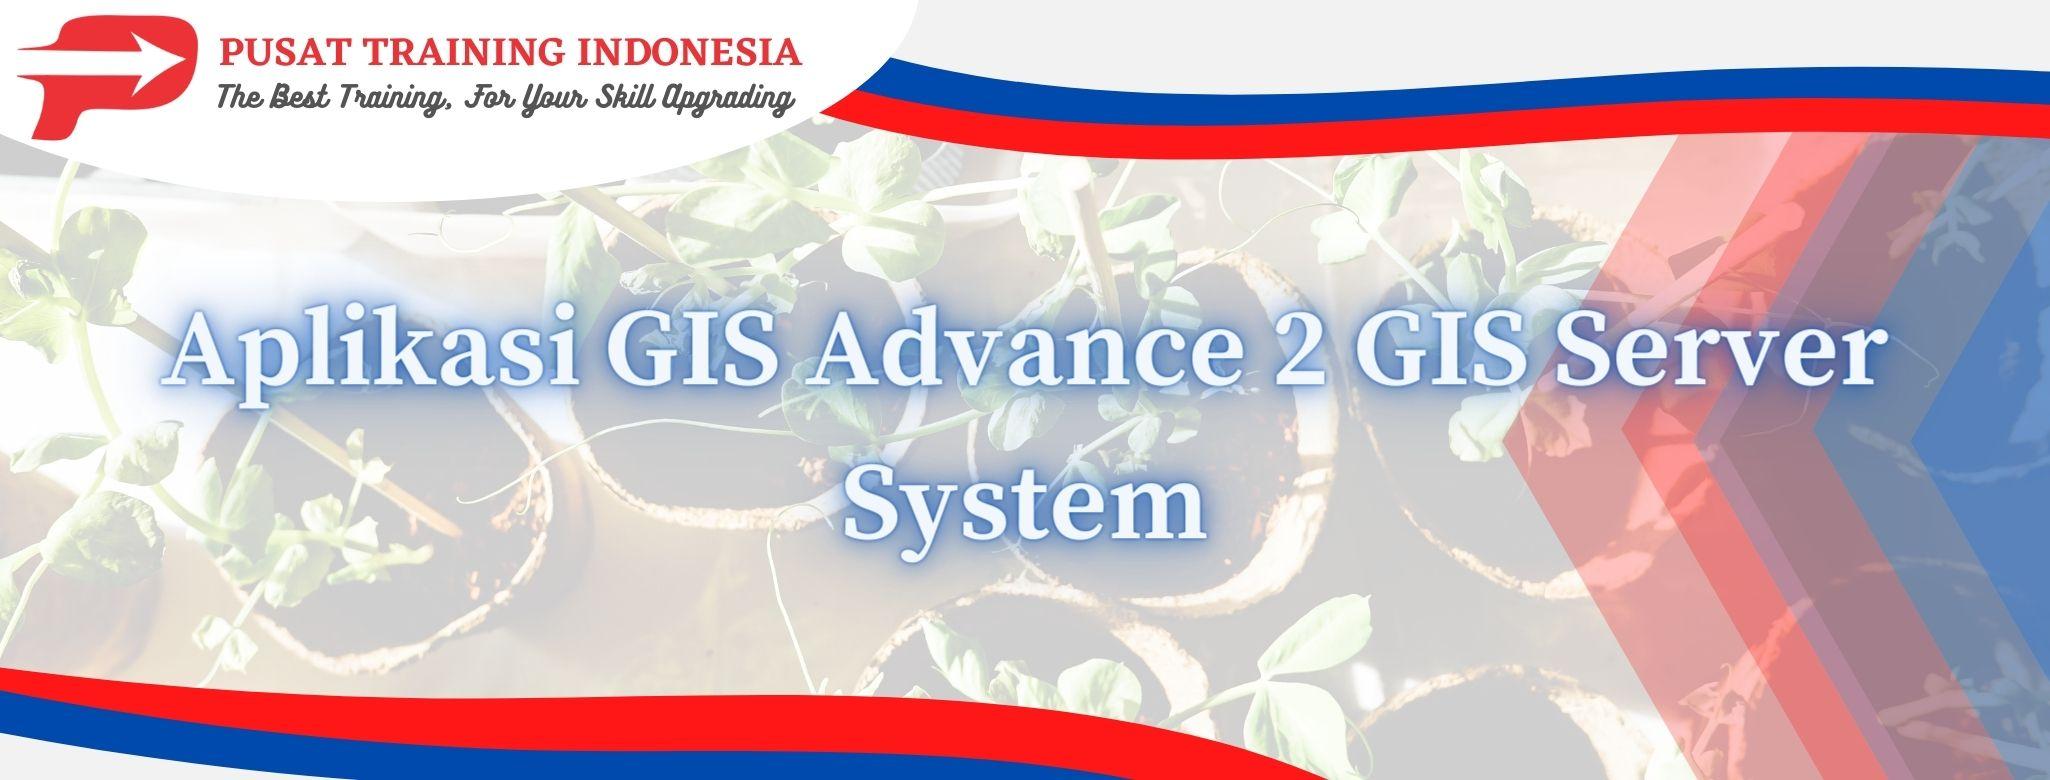 Aplikasi-GIS-Advance-2-GIS-Server-System